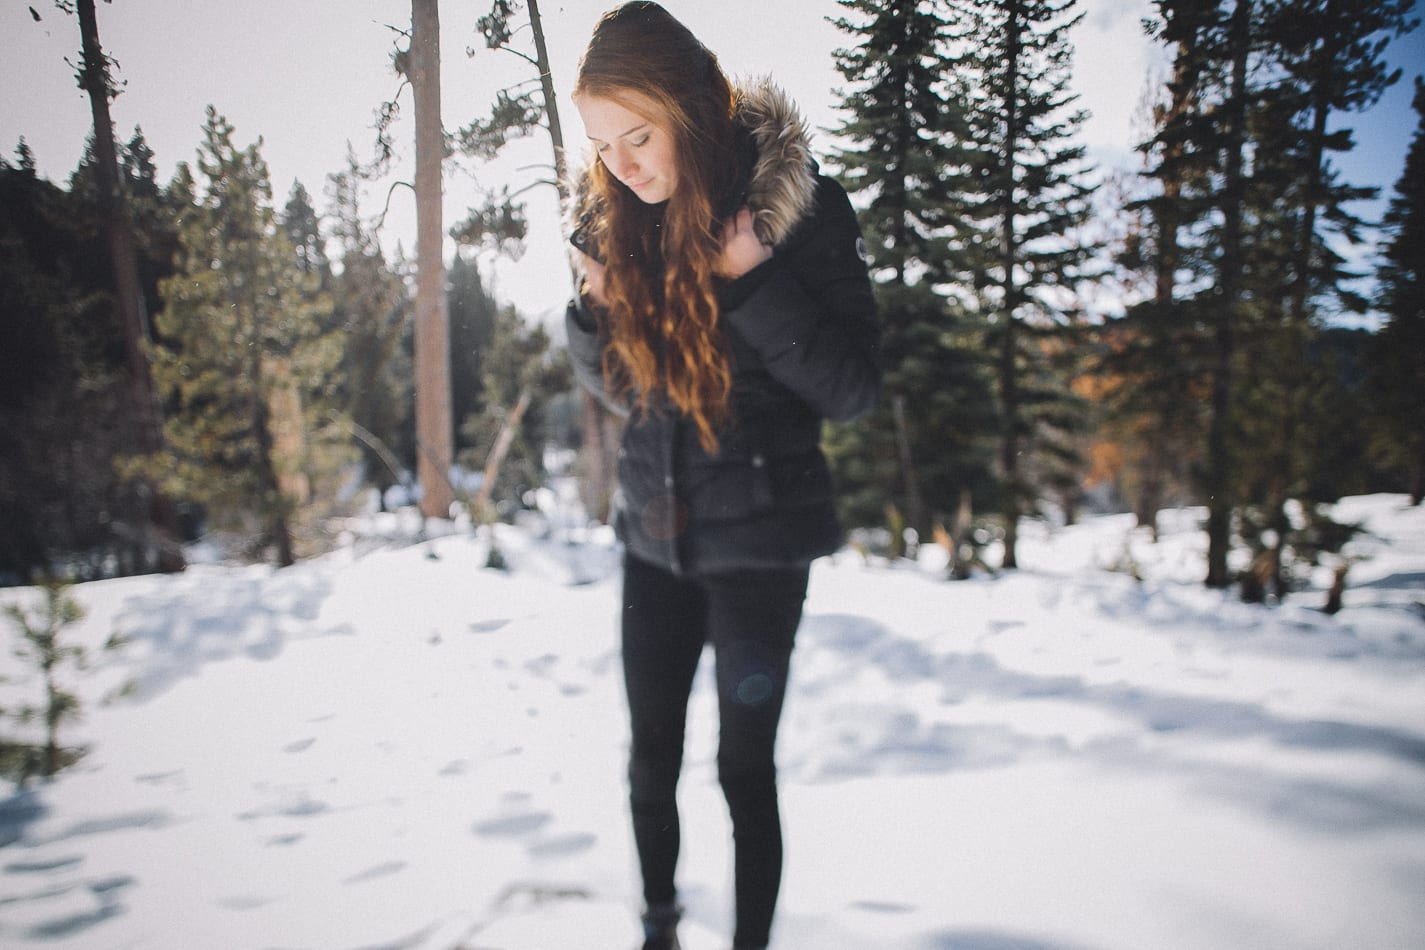 mount-lassen-winter-portrait-photo-3